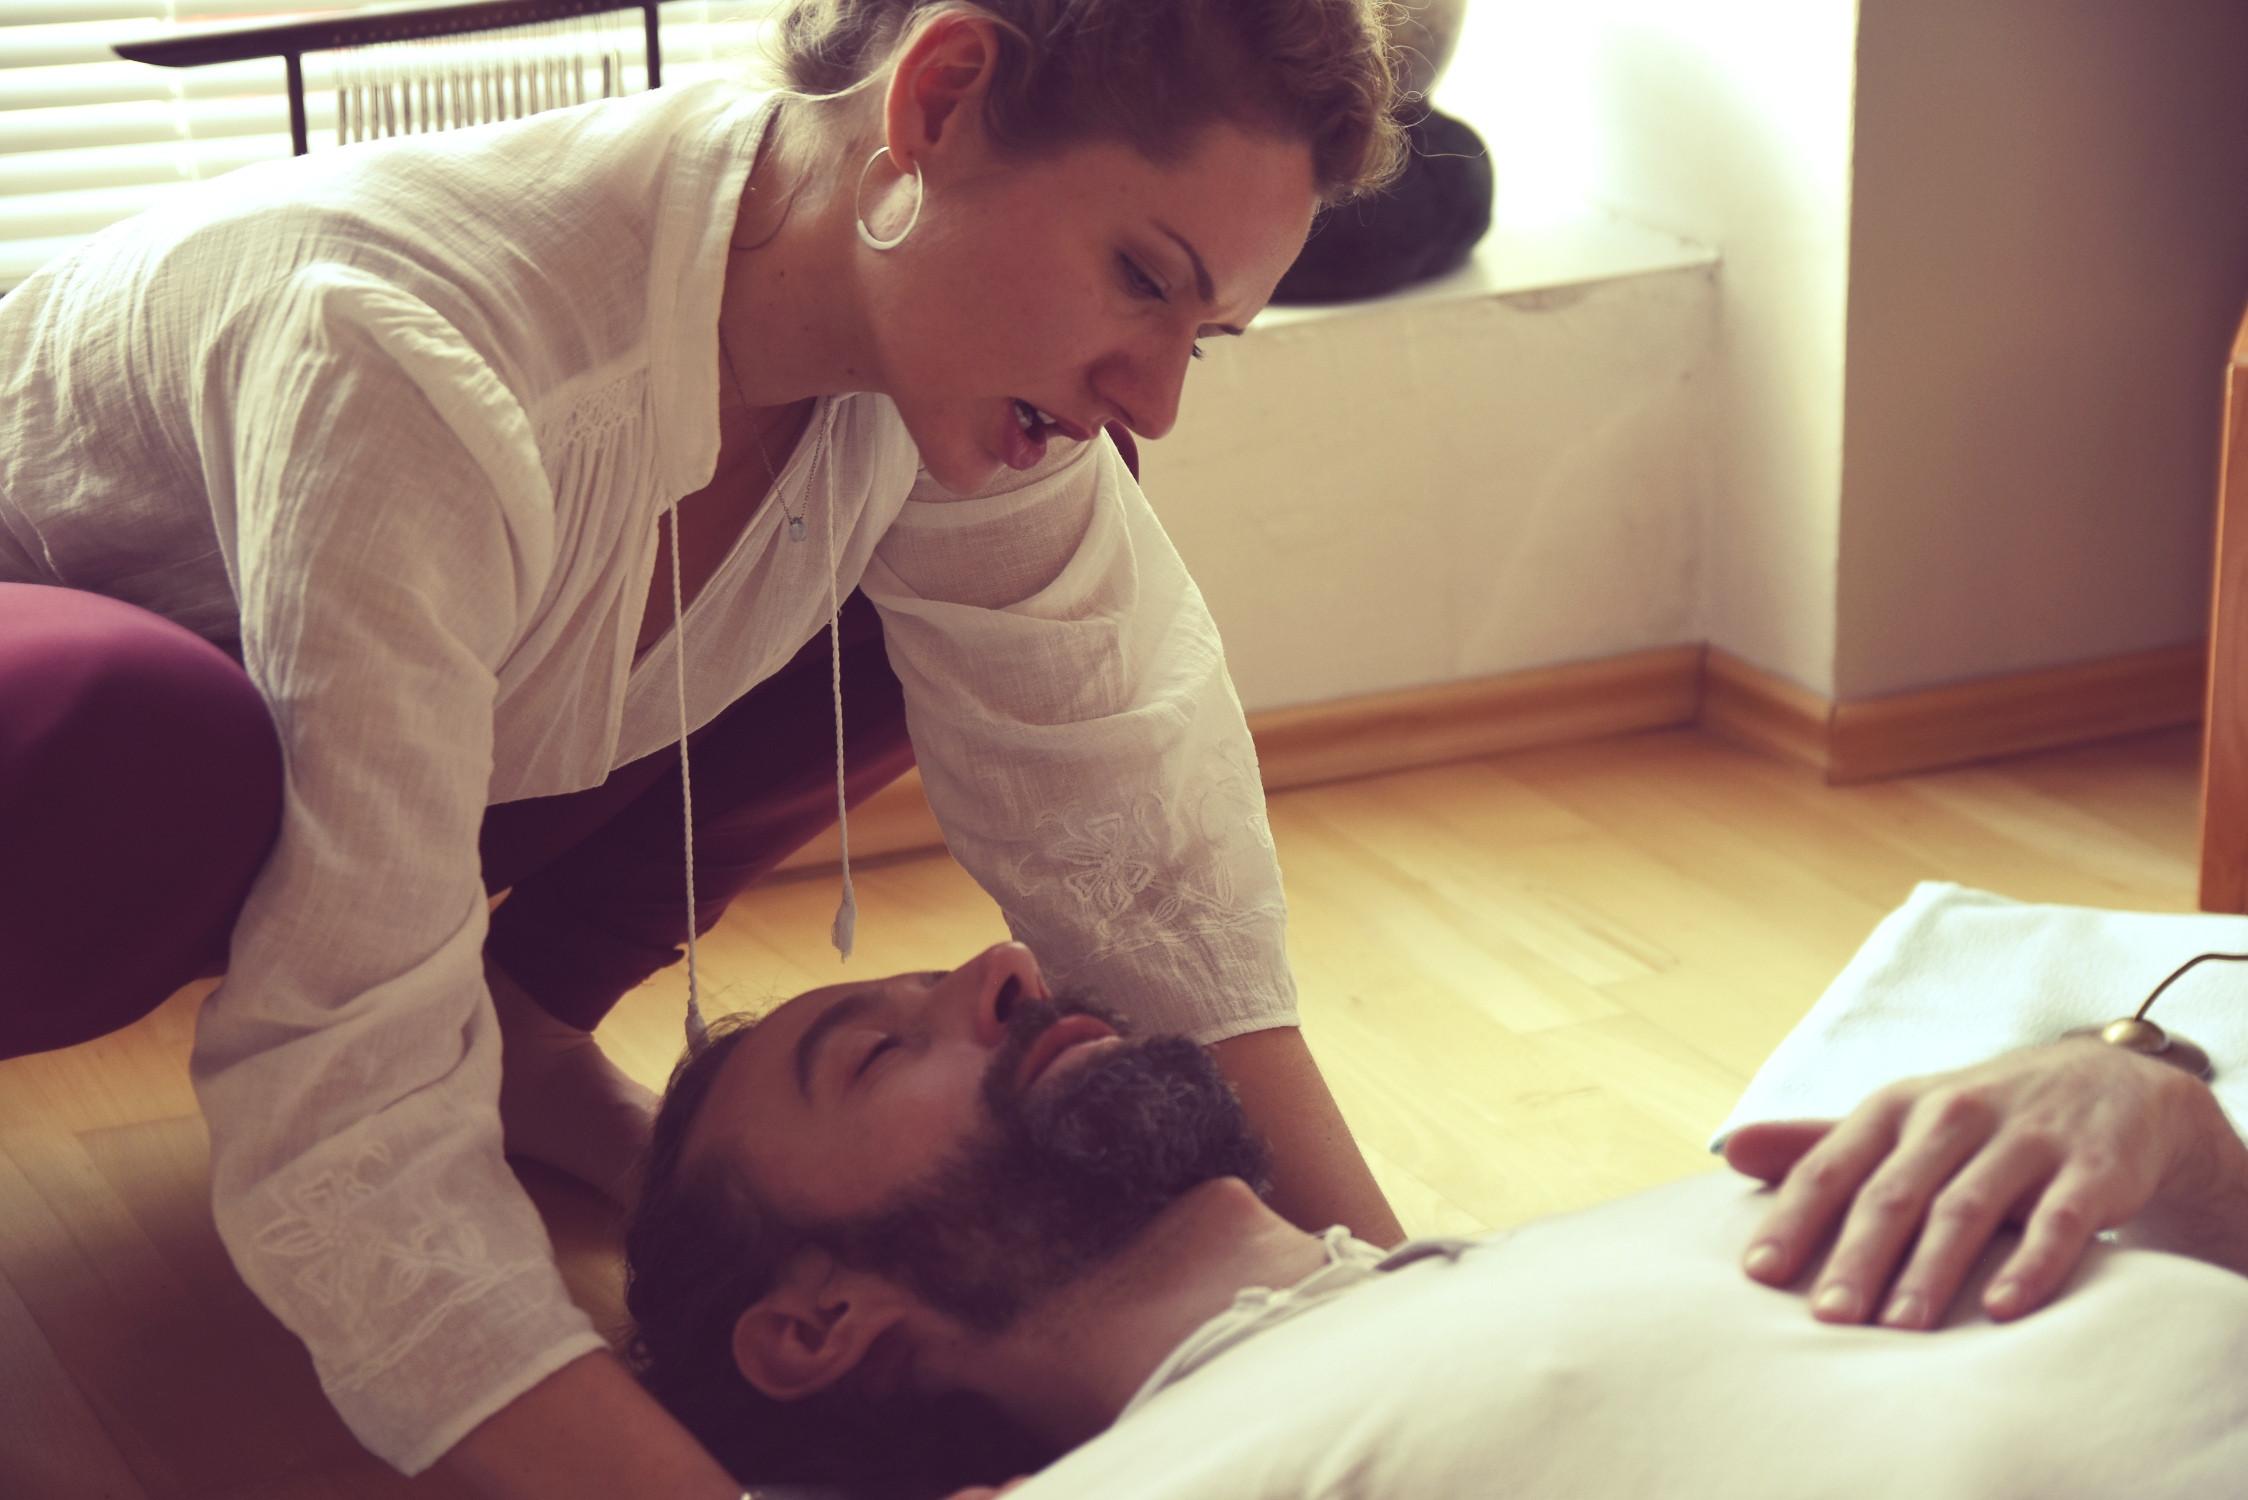 Rebirthing Breathwork Session